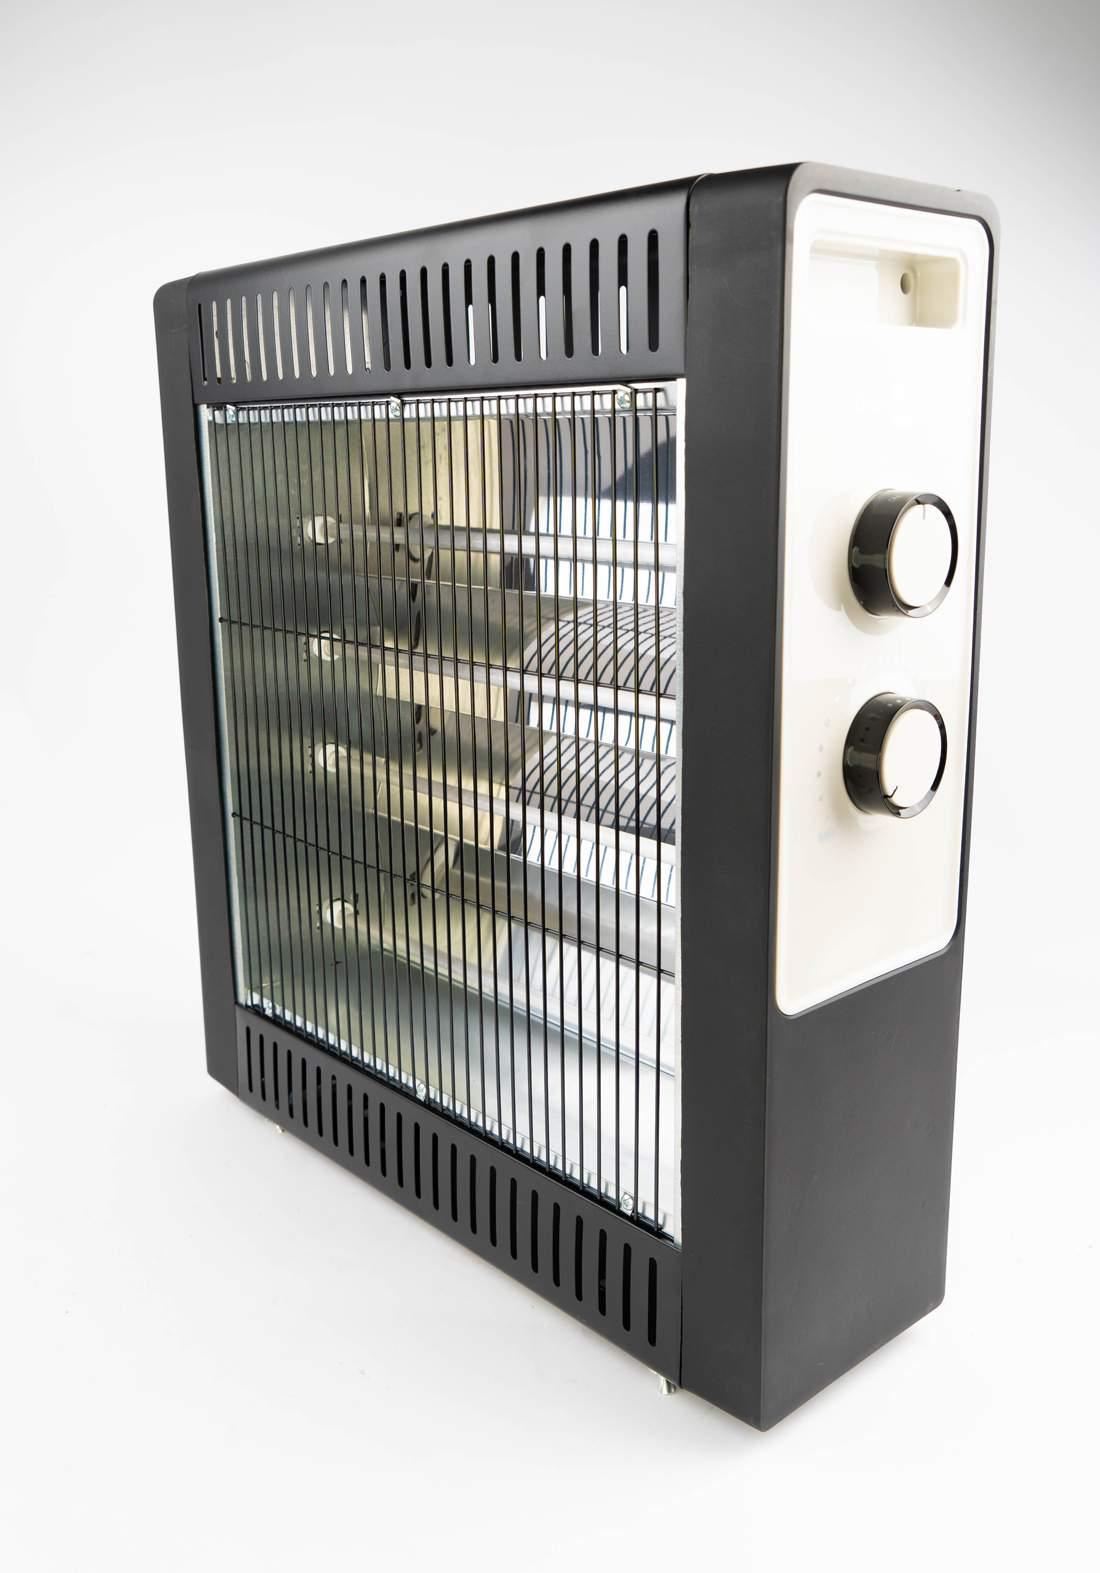 DecoVolt 6028 quartz Heater 1100-2200W مدفئة كوارتز 1100-2200 واط 4 شمعات